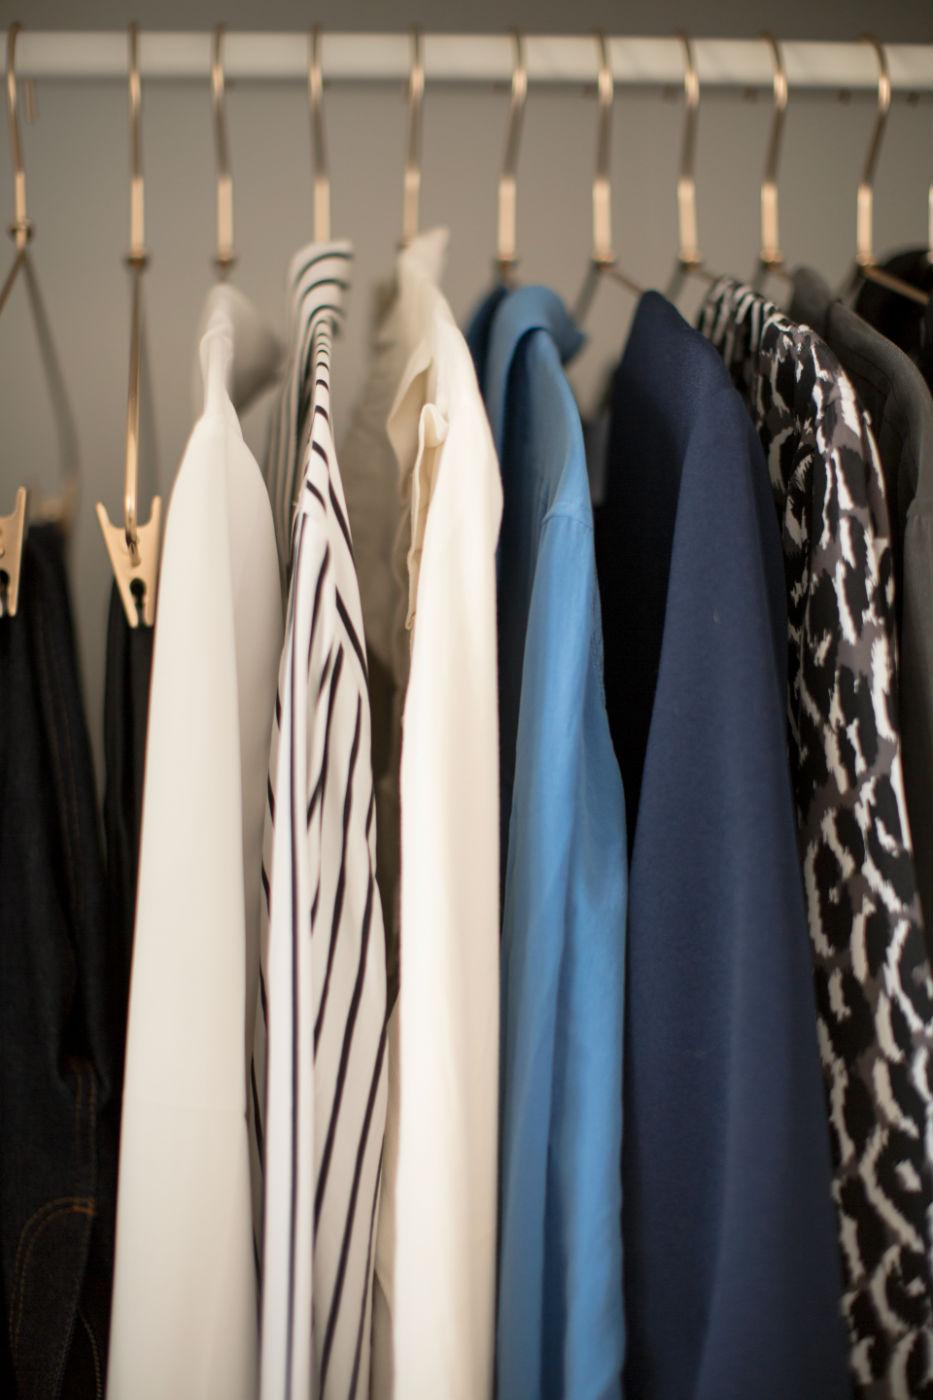 theannaedit-winter-wardrobe-organisation-youtube-december-2016-4